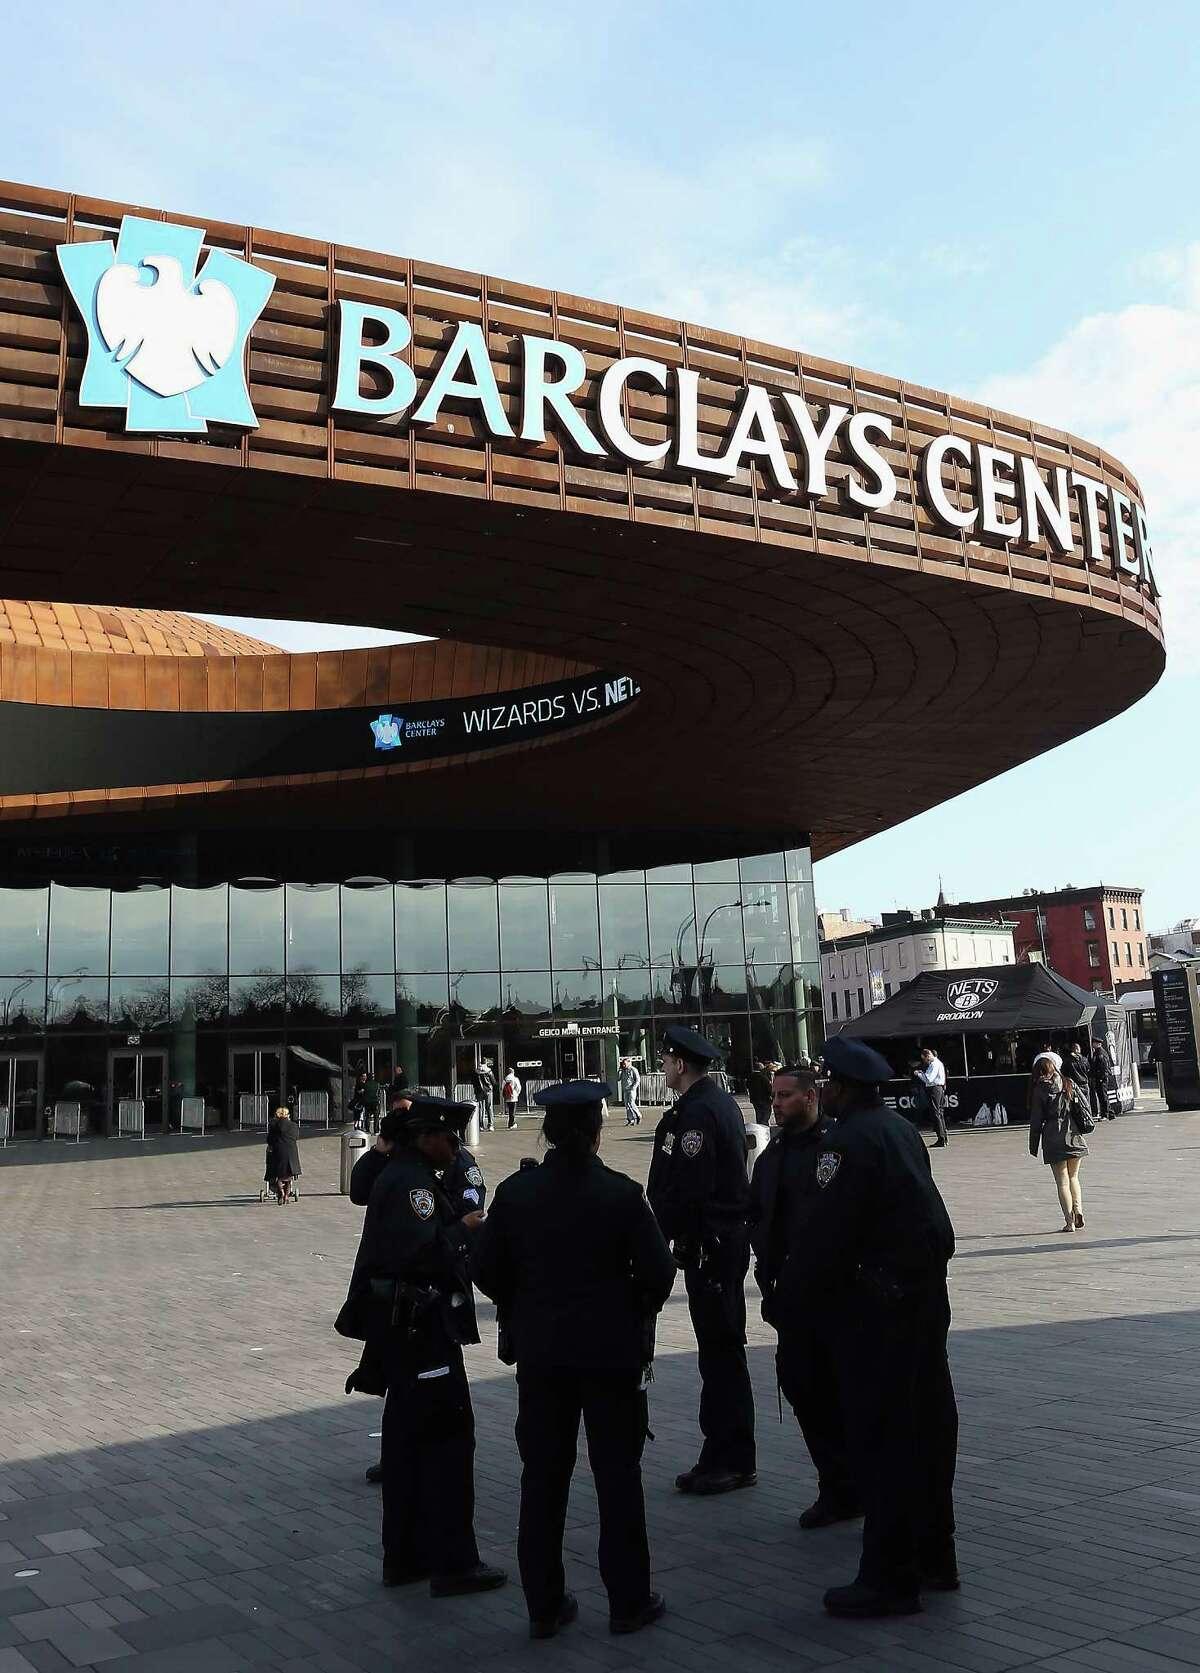 Barclays Center - Brooklyn Nets - $20 million per year.